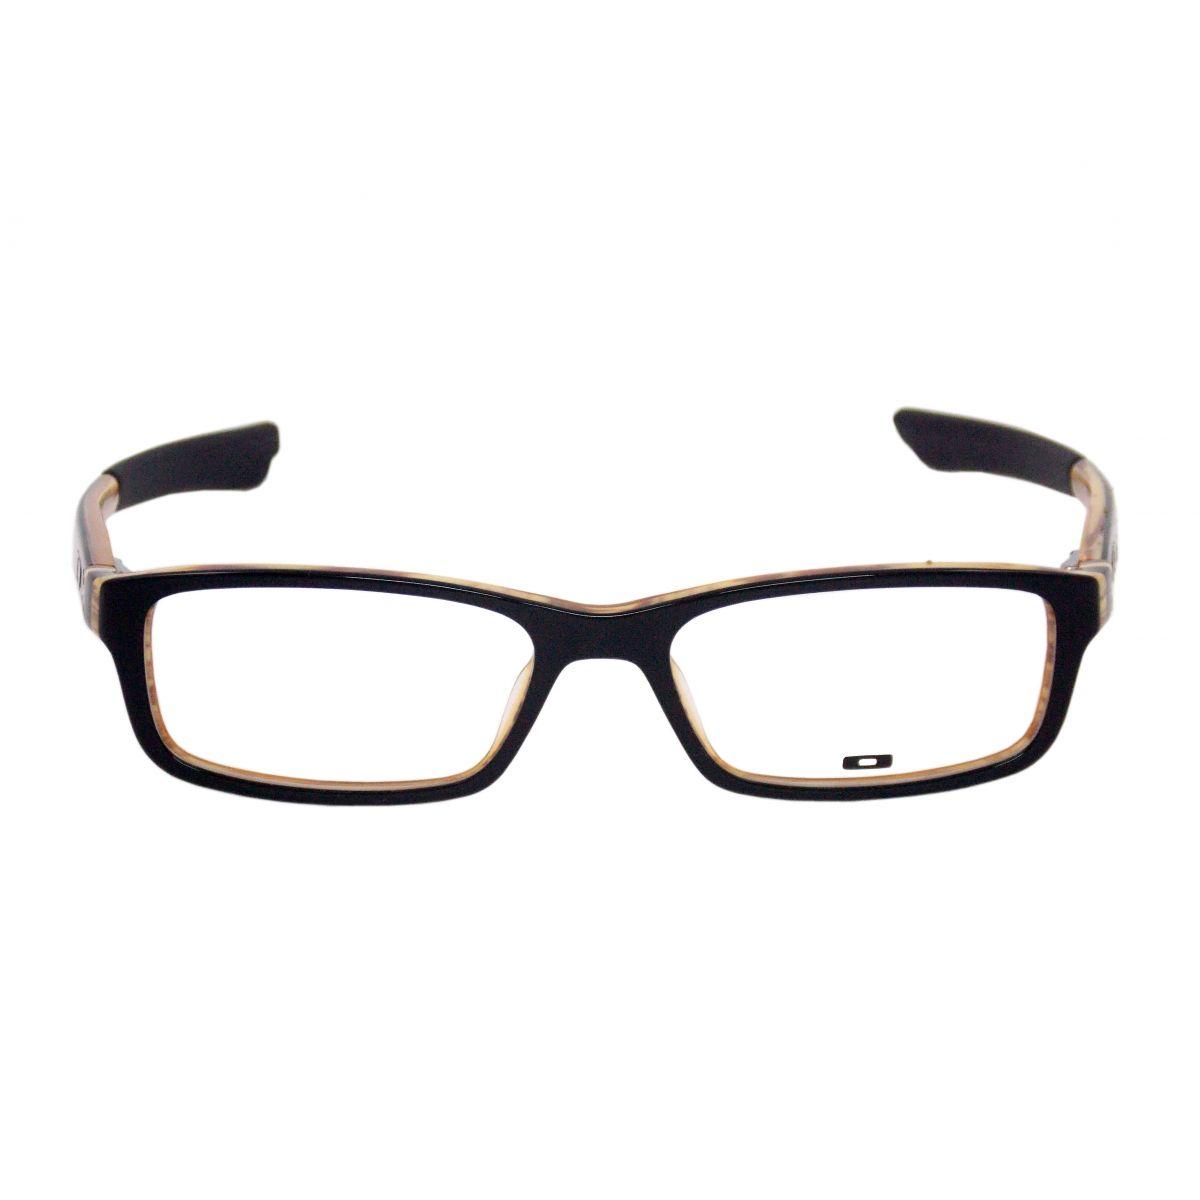 d181de8749c88 Armações Oakley- Oculos De Grau   Green Communities Canada